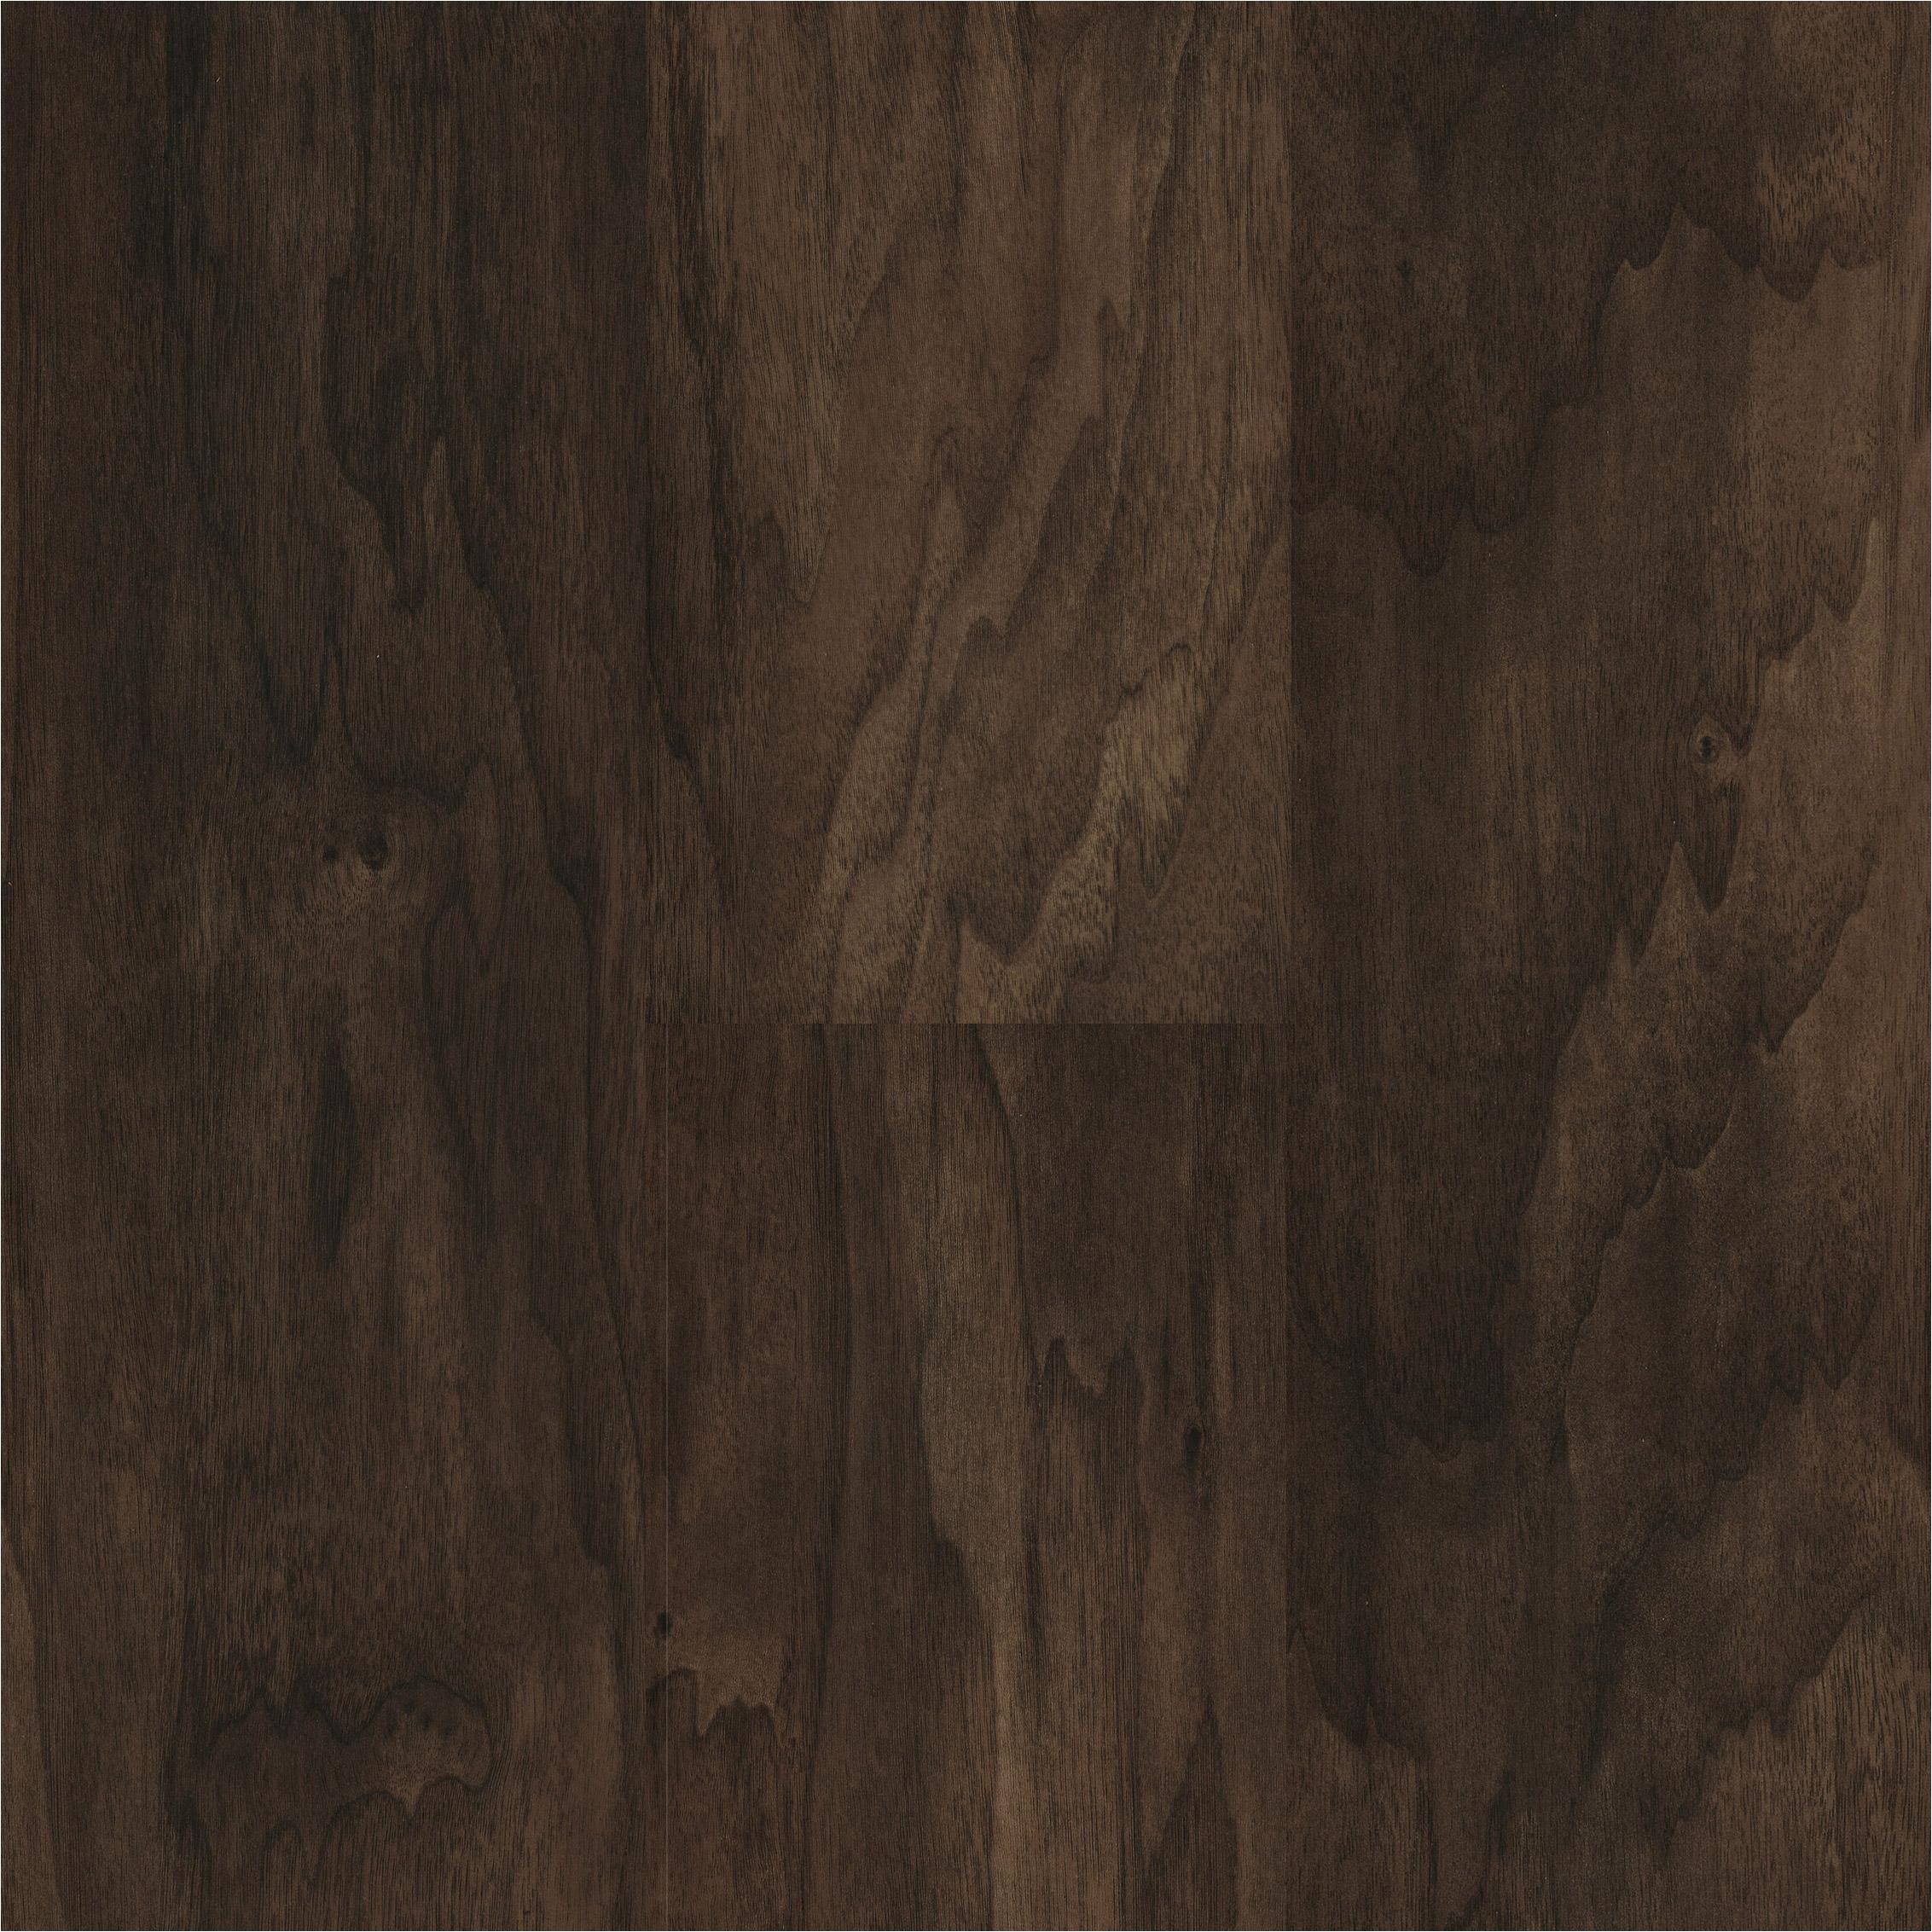 Click together Floating Vinyl Plank Flooring Ivc Moduleo Horizon Walnut 7 56 Luxury Vinyl Plank Flooring Vinyl